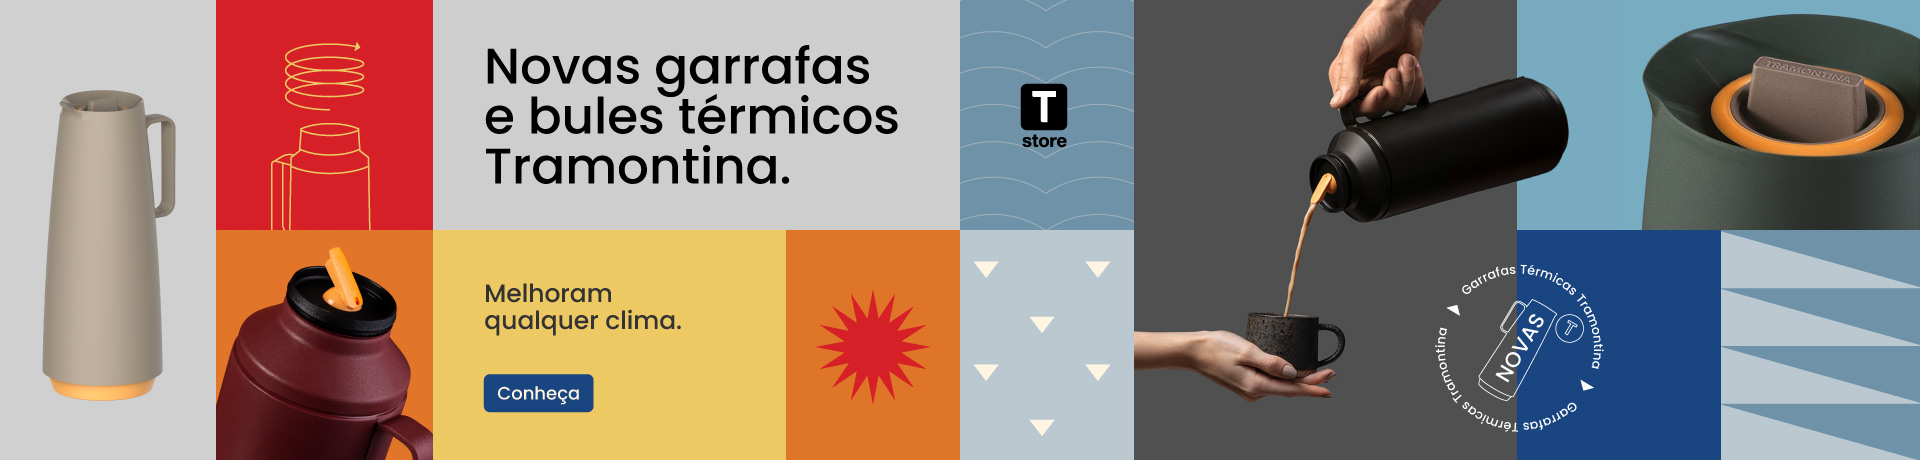 Banner 4 - Garrafas Térmicas